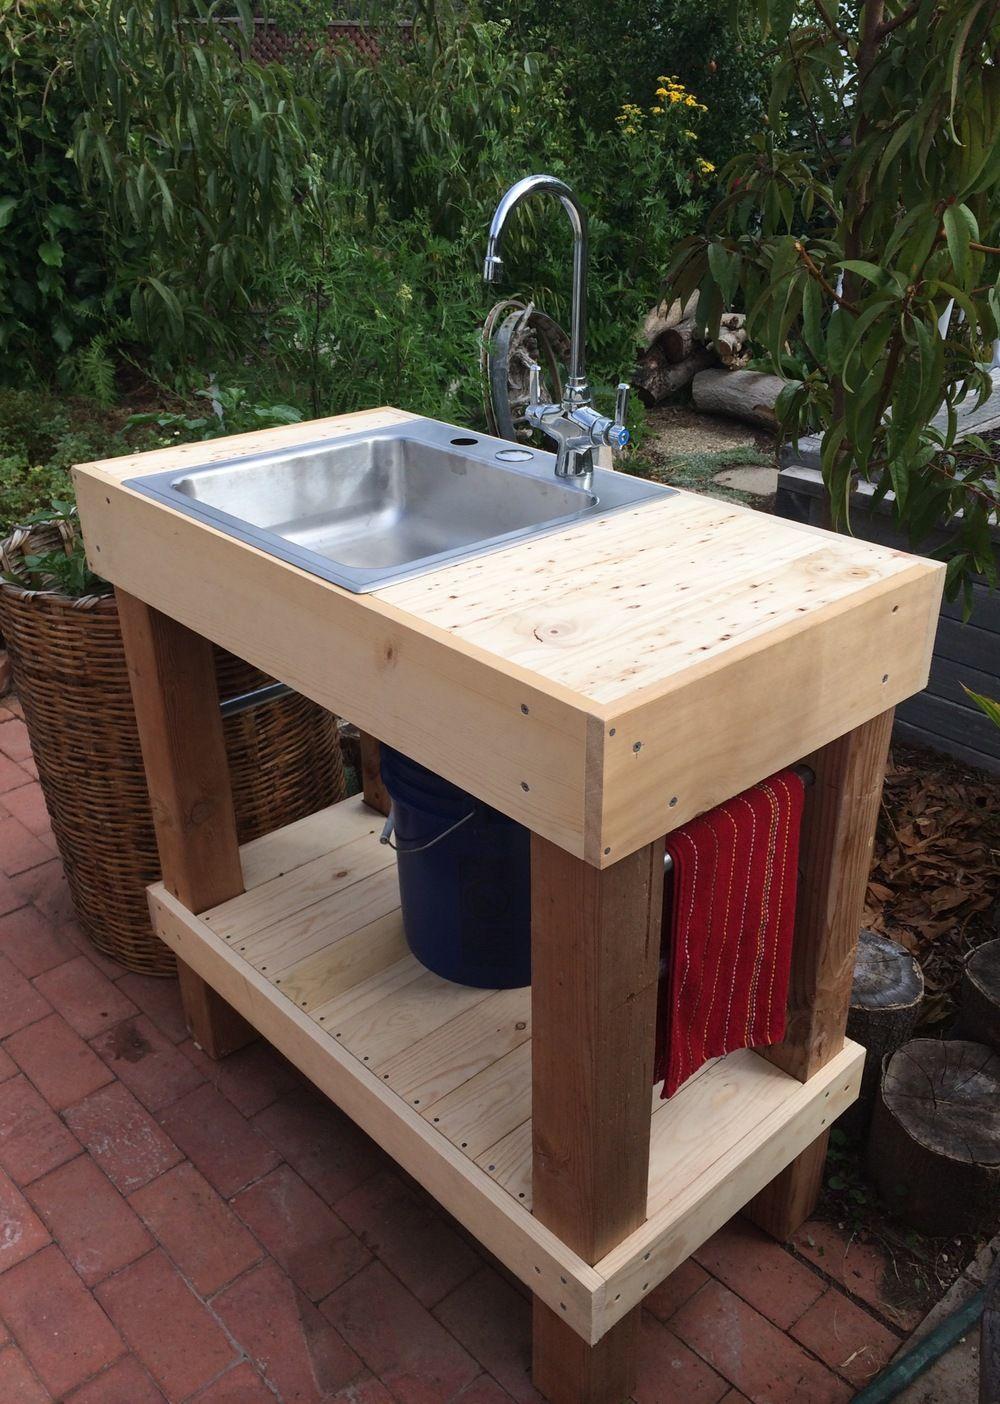 A Garden Sink Will Come Handy For Your Washing Needs Outdoor Sinks Garden Sink Sink